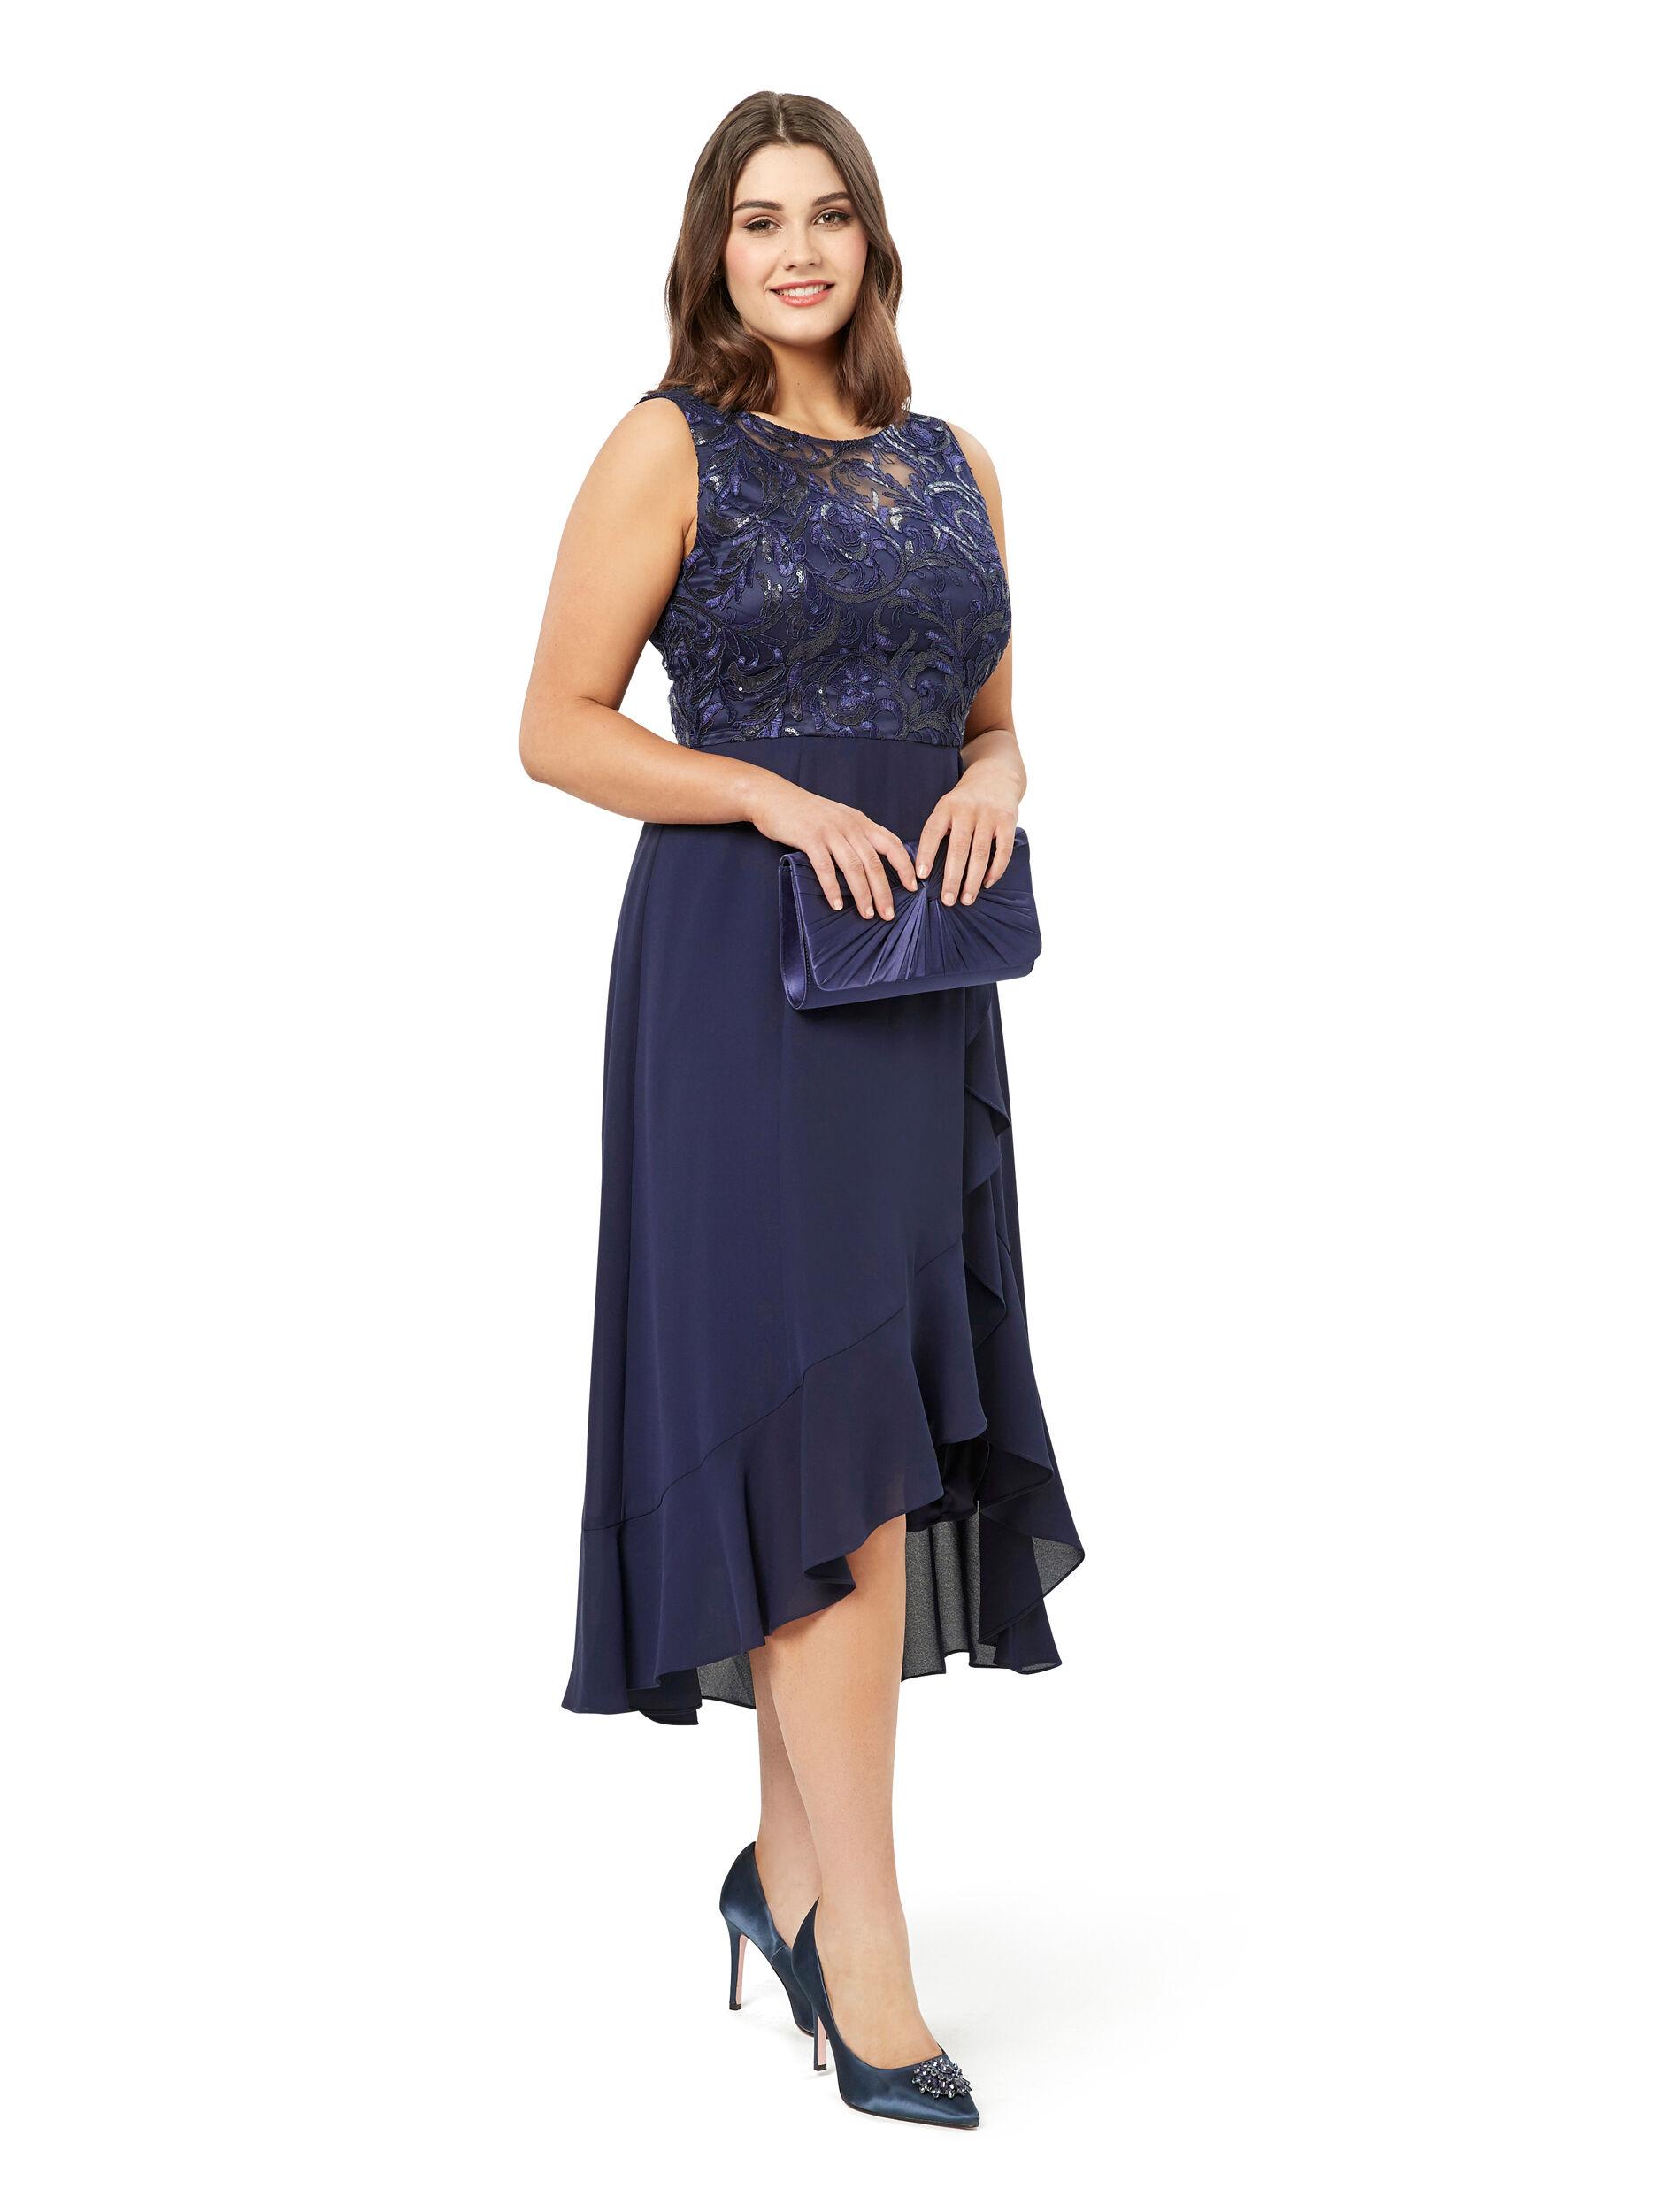 Melody Love Dress